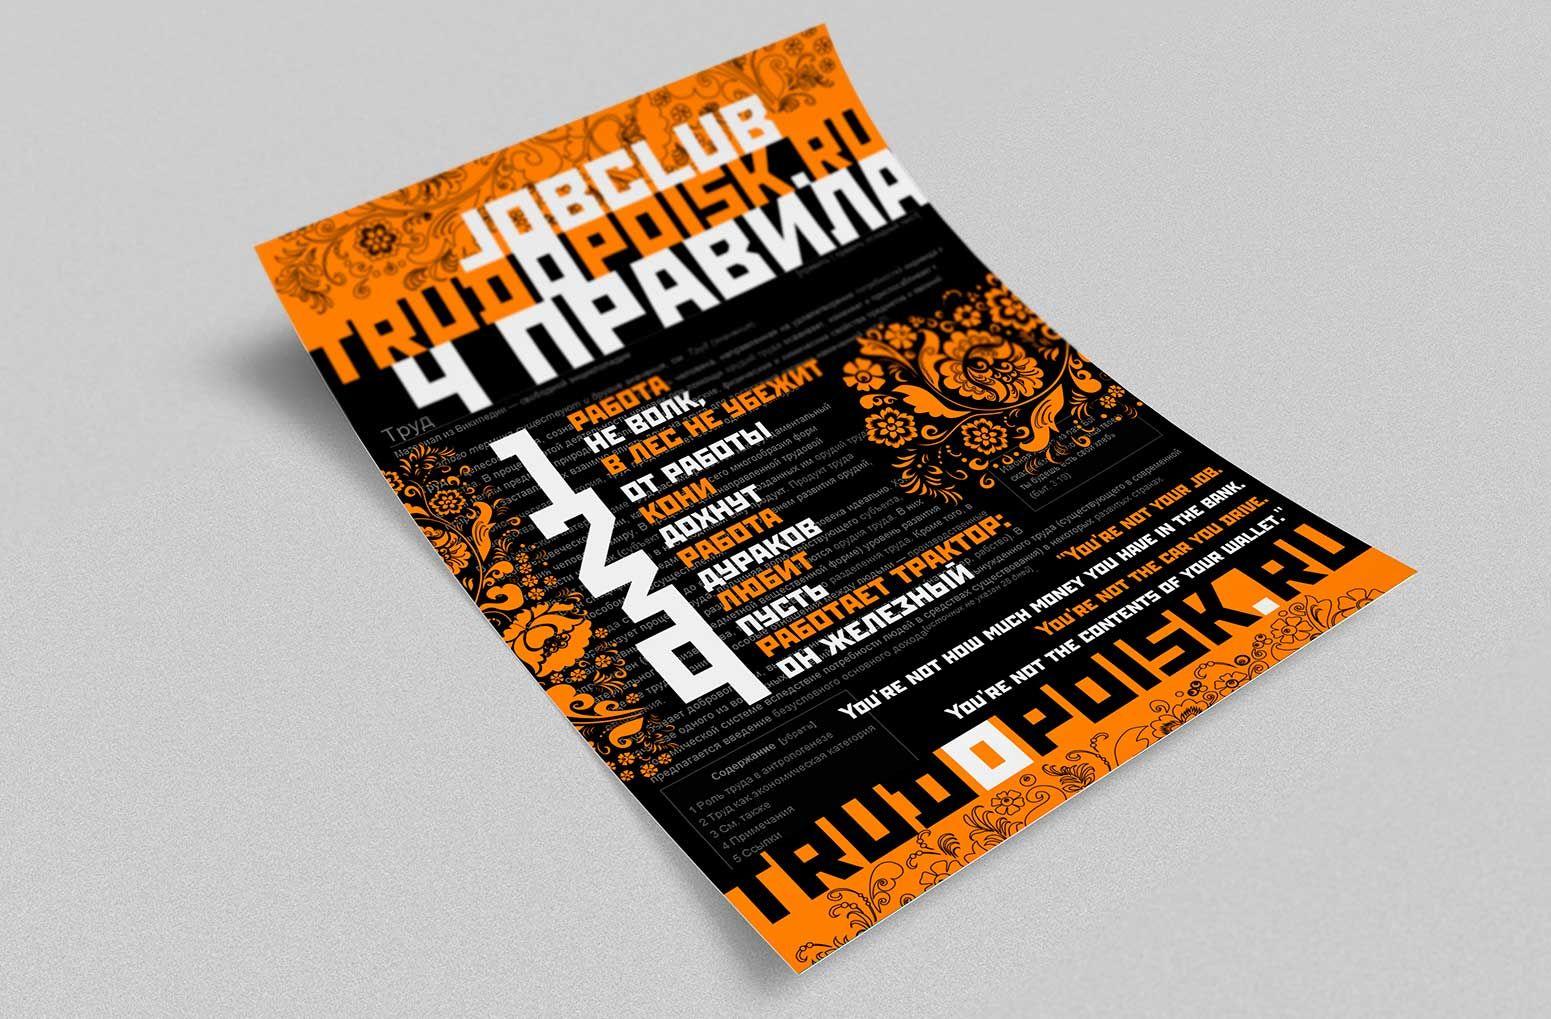 Креатив для постера Трудопоиск.ру  - дизайнер path